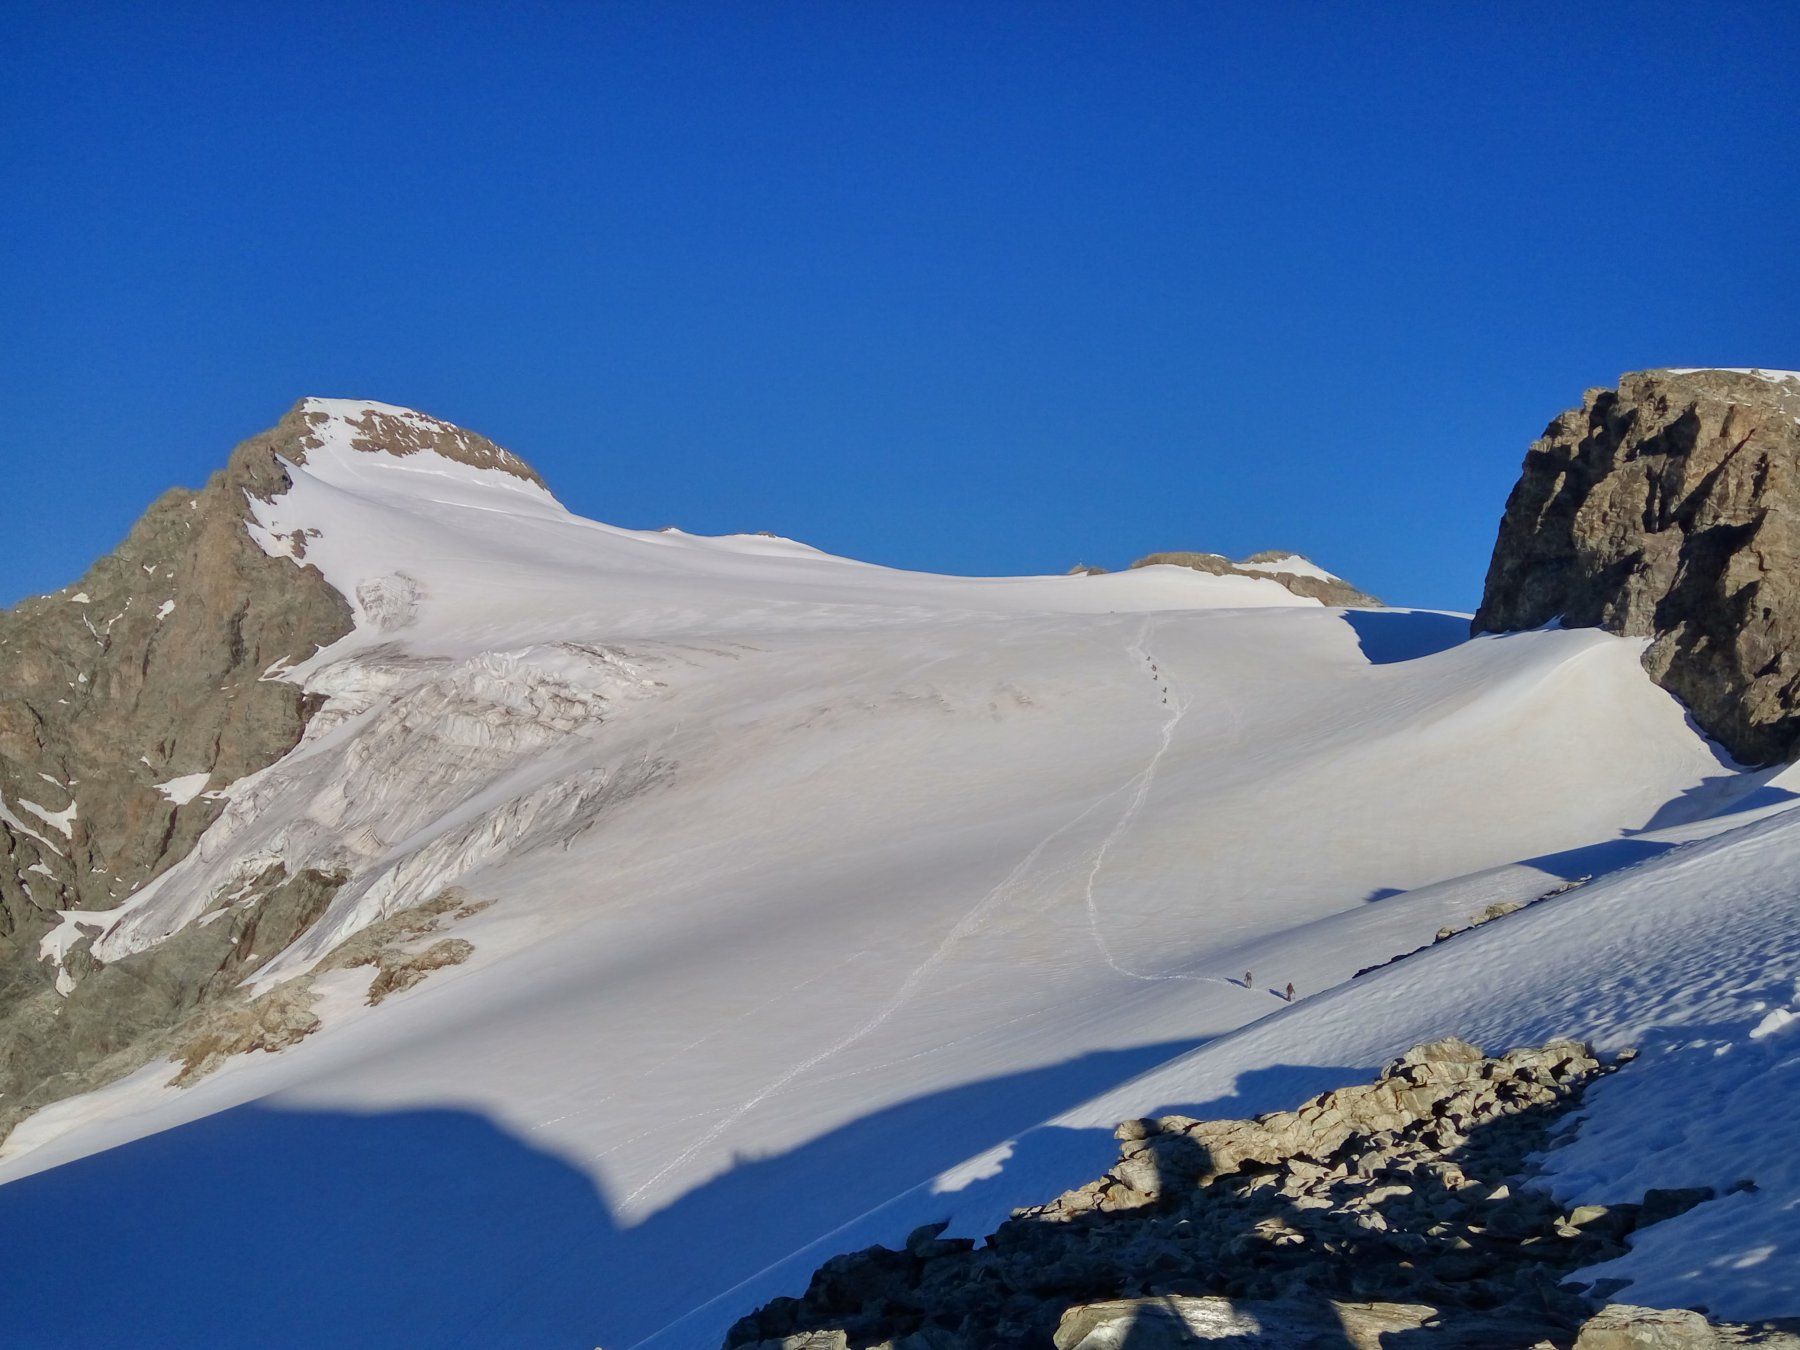 ghiacciaio e cima, traccia evidente